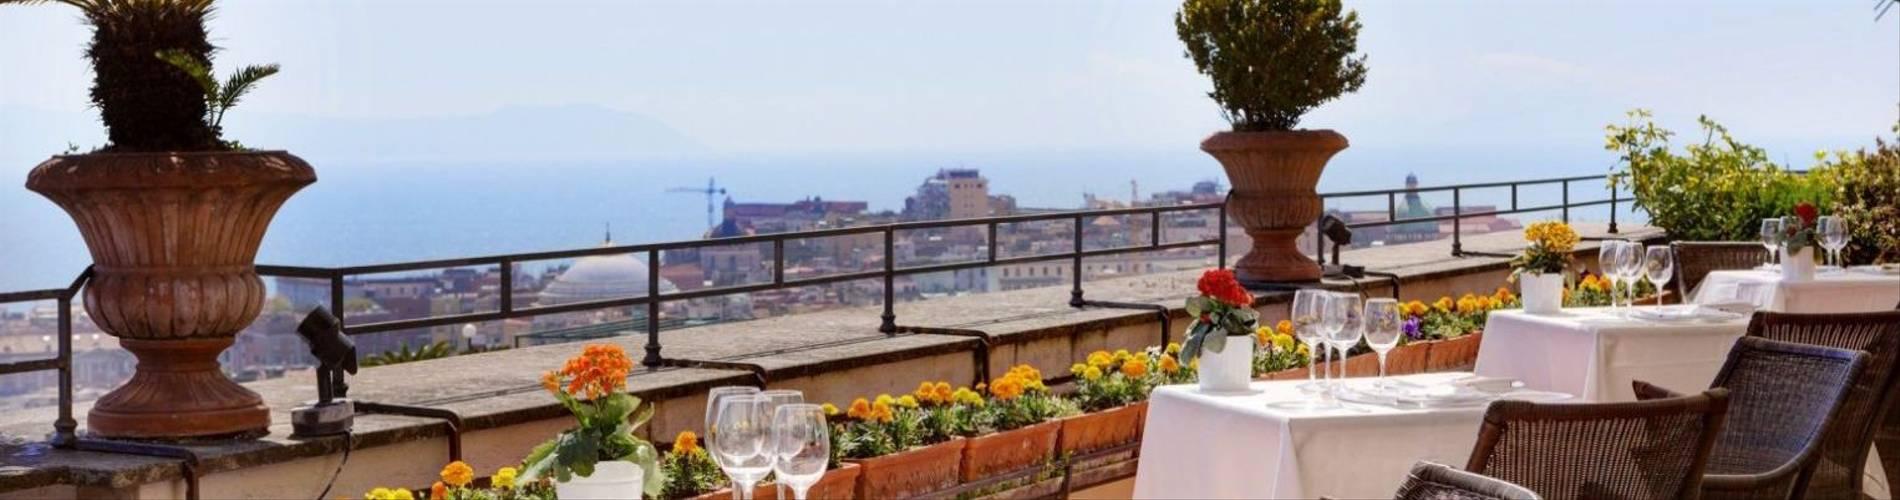 San Francesco Al Monte, Naples, Italy (20).JPG